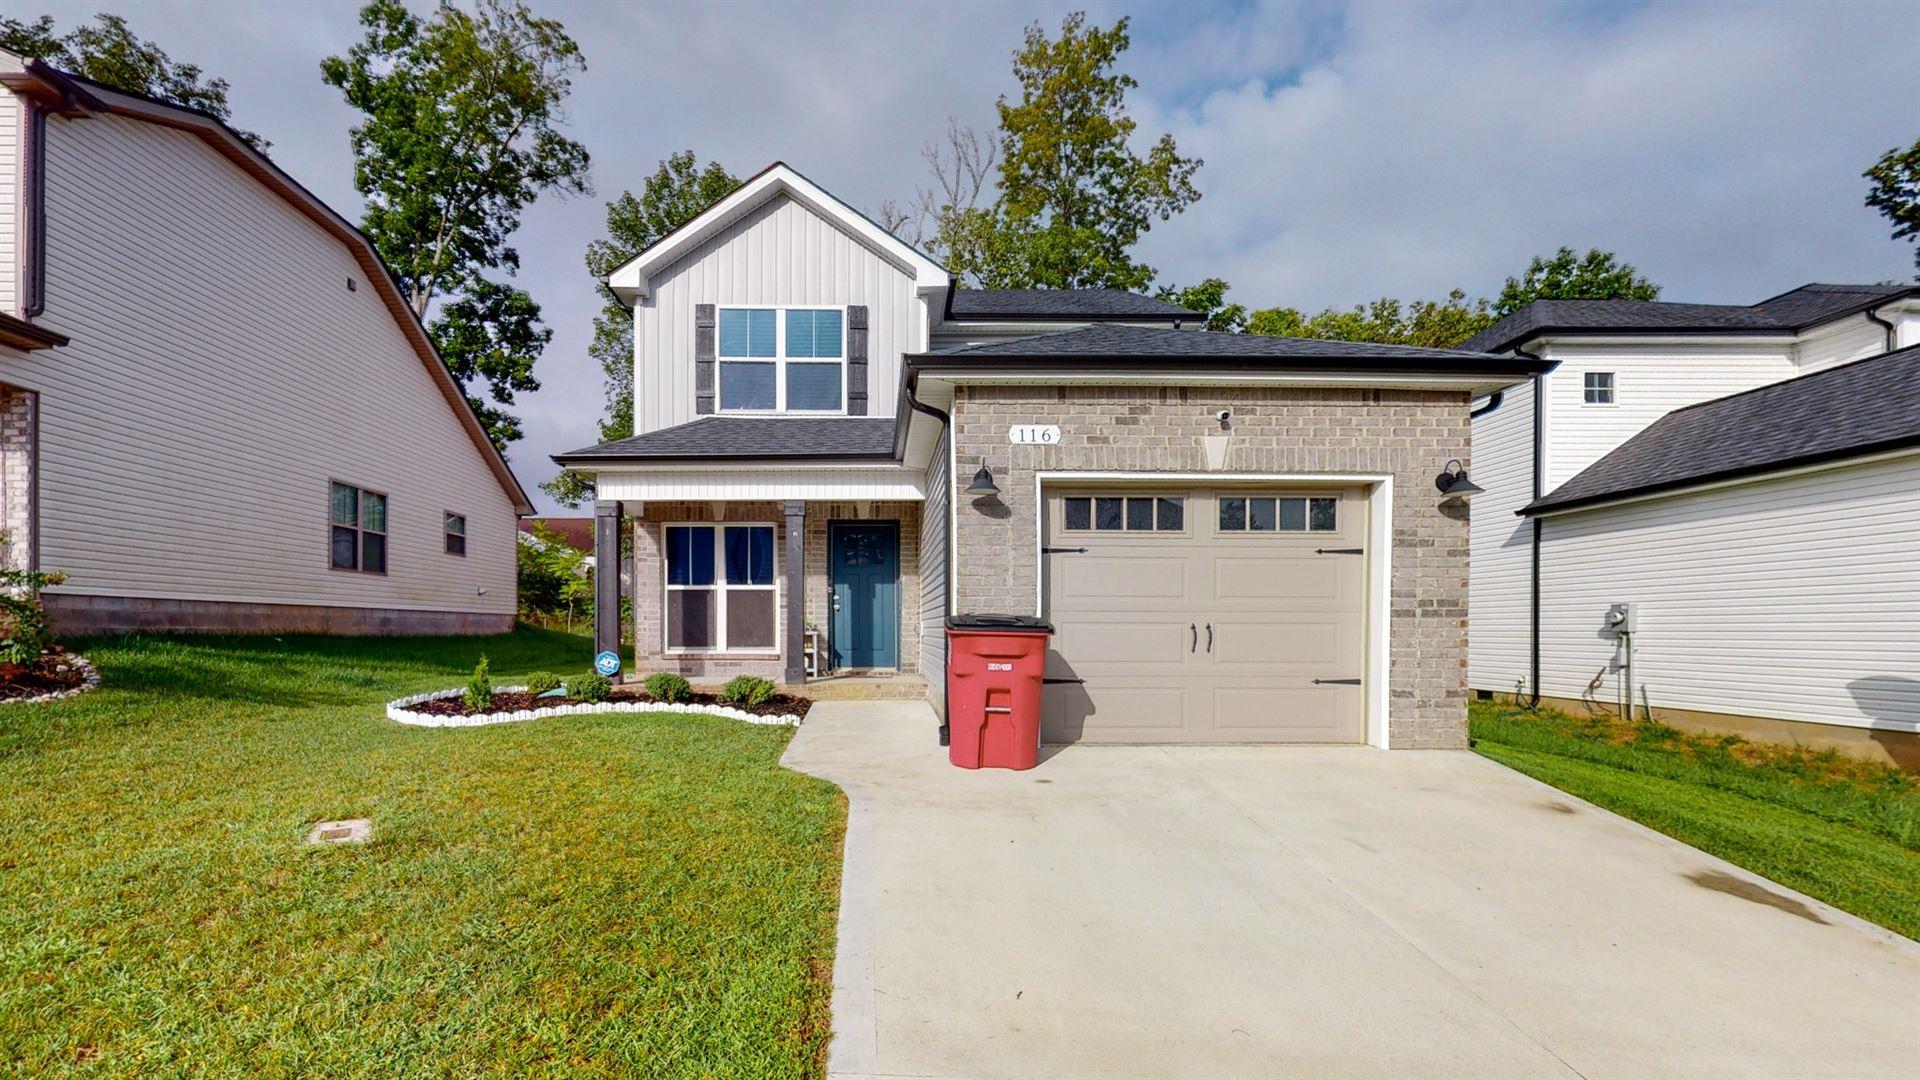 116 Waterwheel Cir, Clarksville, TN 37042 - MLS#: 2293215